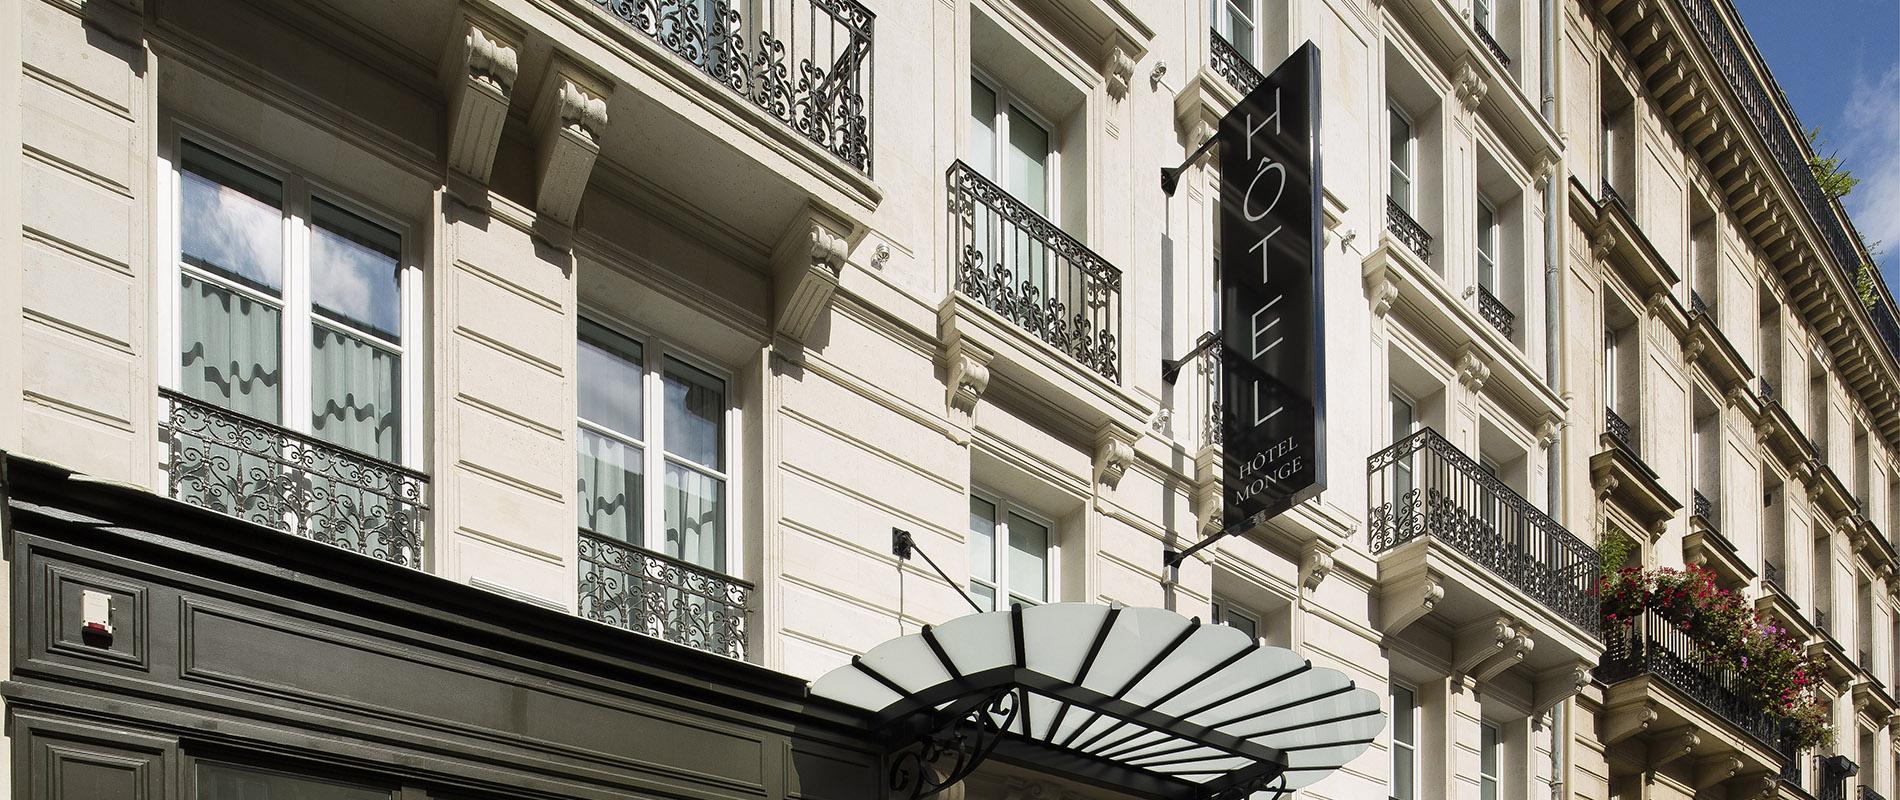 Facade Hotel Monge